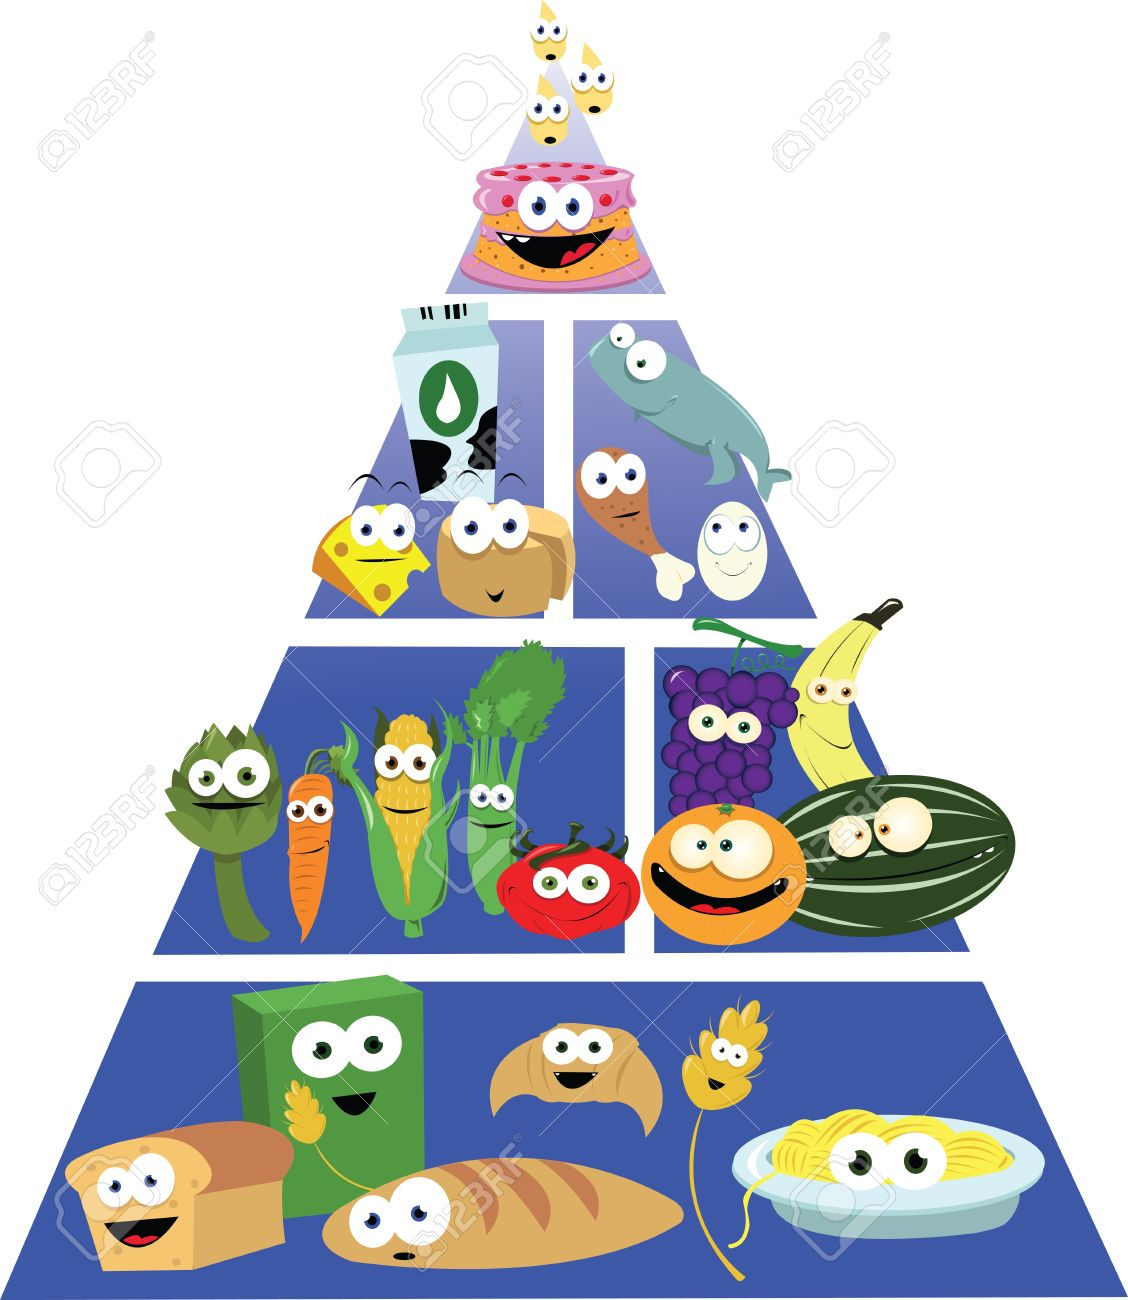 food pyramid: A cartoon representing a f-food pyramid: A cartoon representing a funny food pyramid Illustration-15